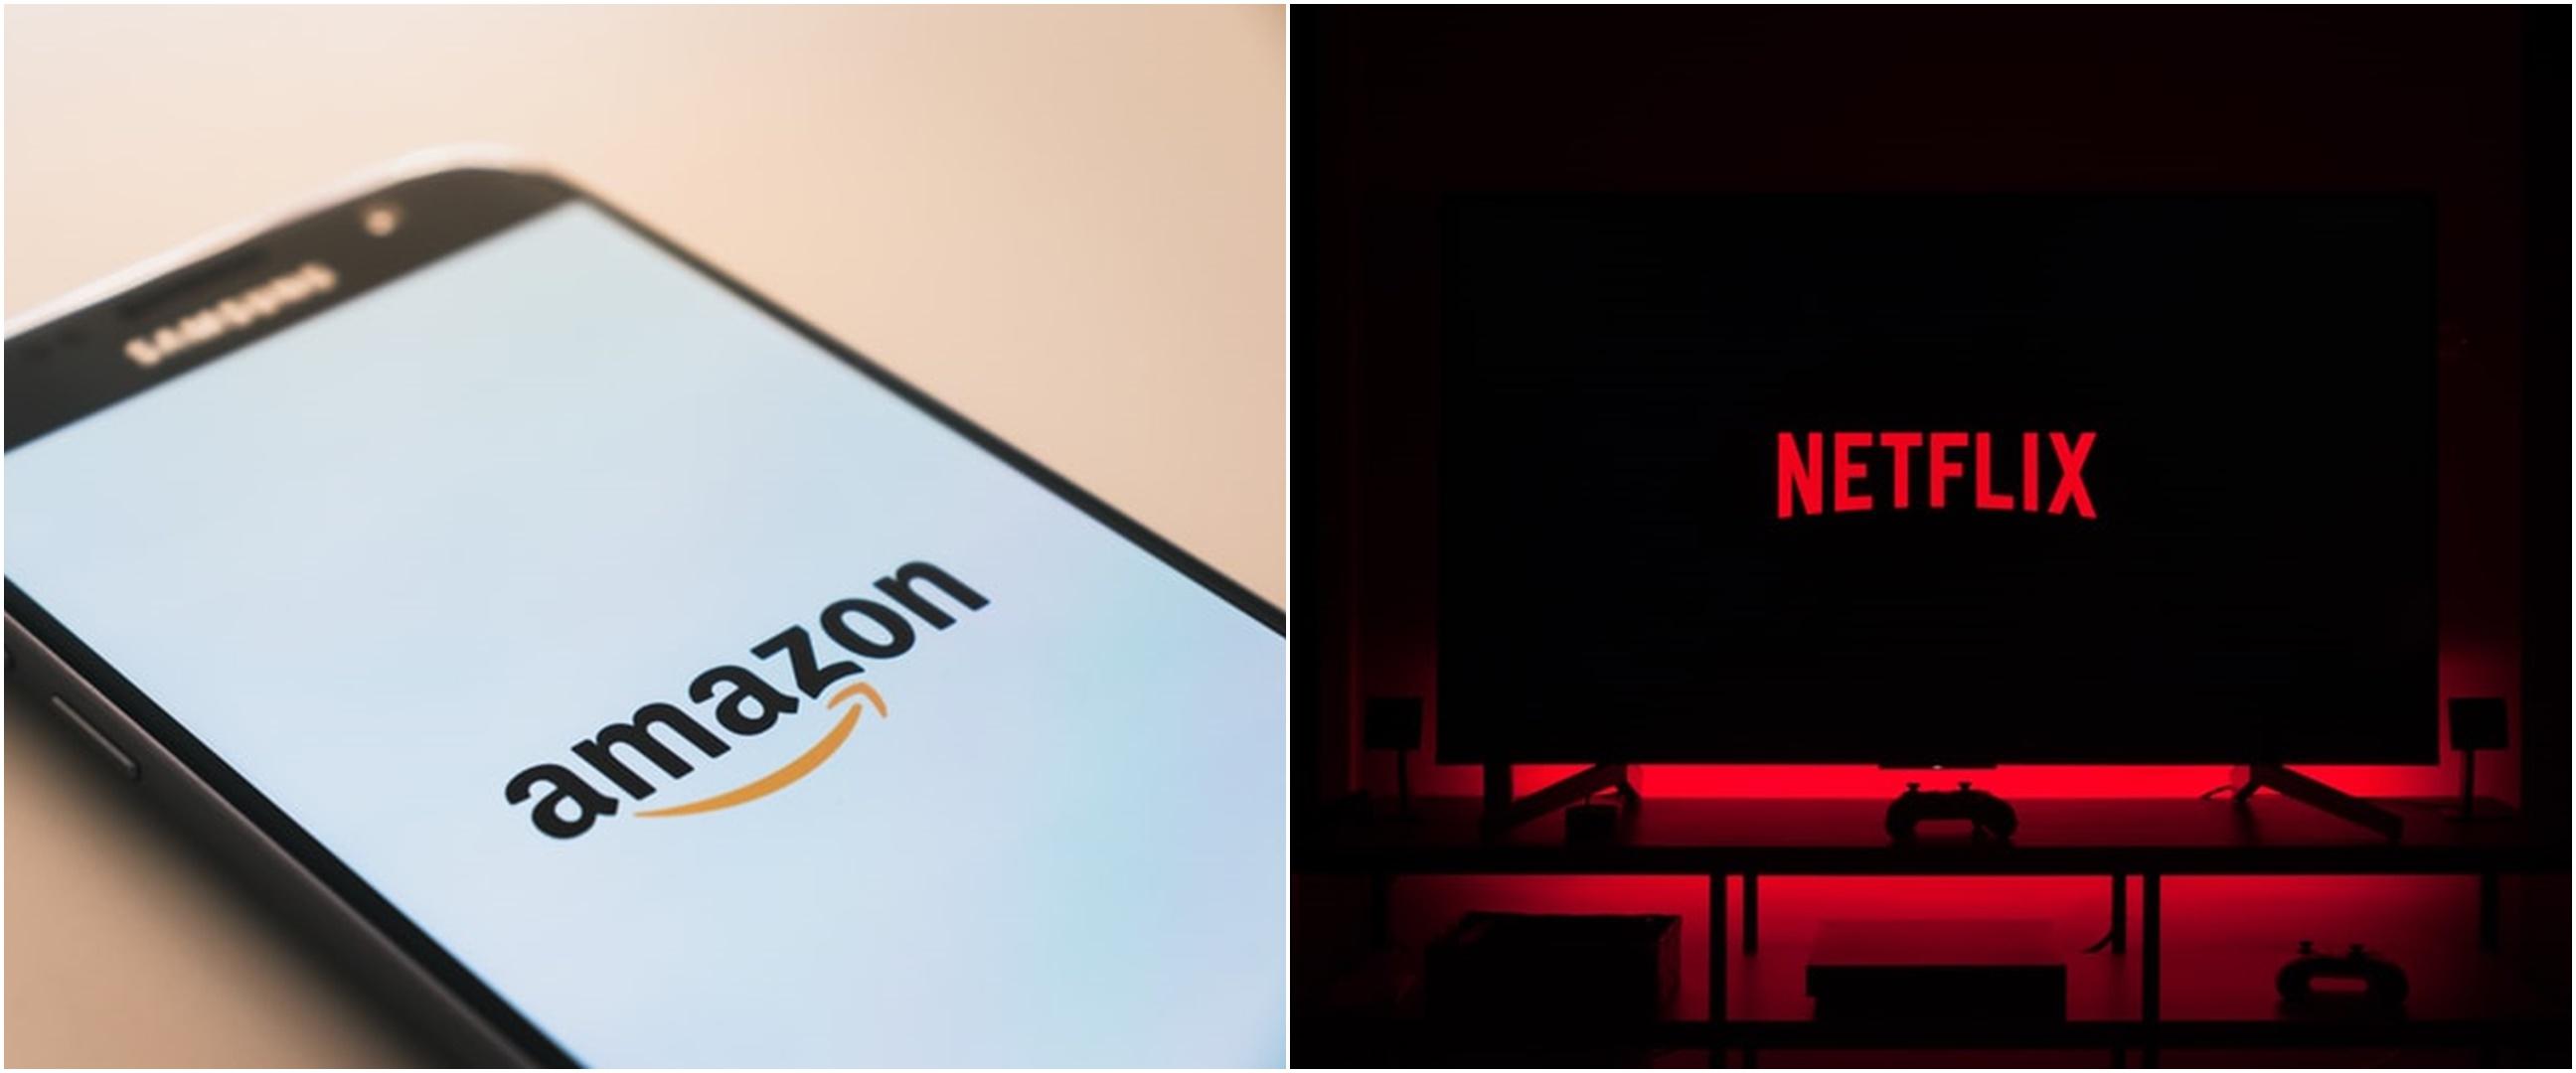 Intip pendapatan per menit Amazon hingga Netflix, bikin melongo